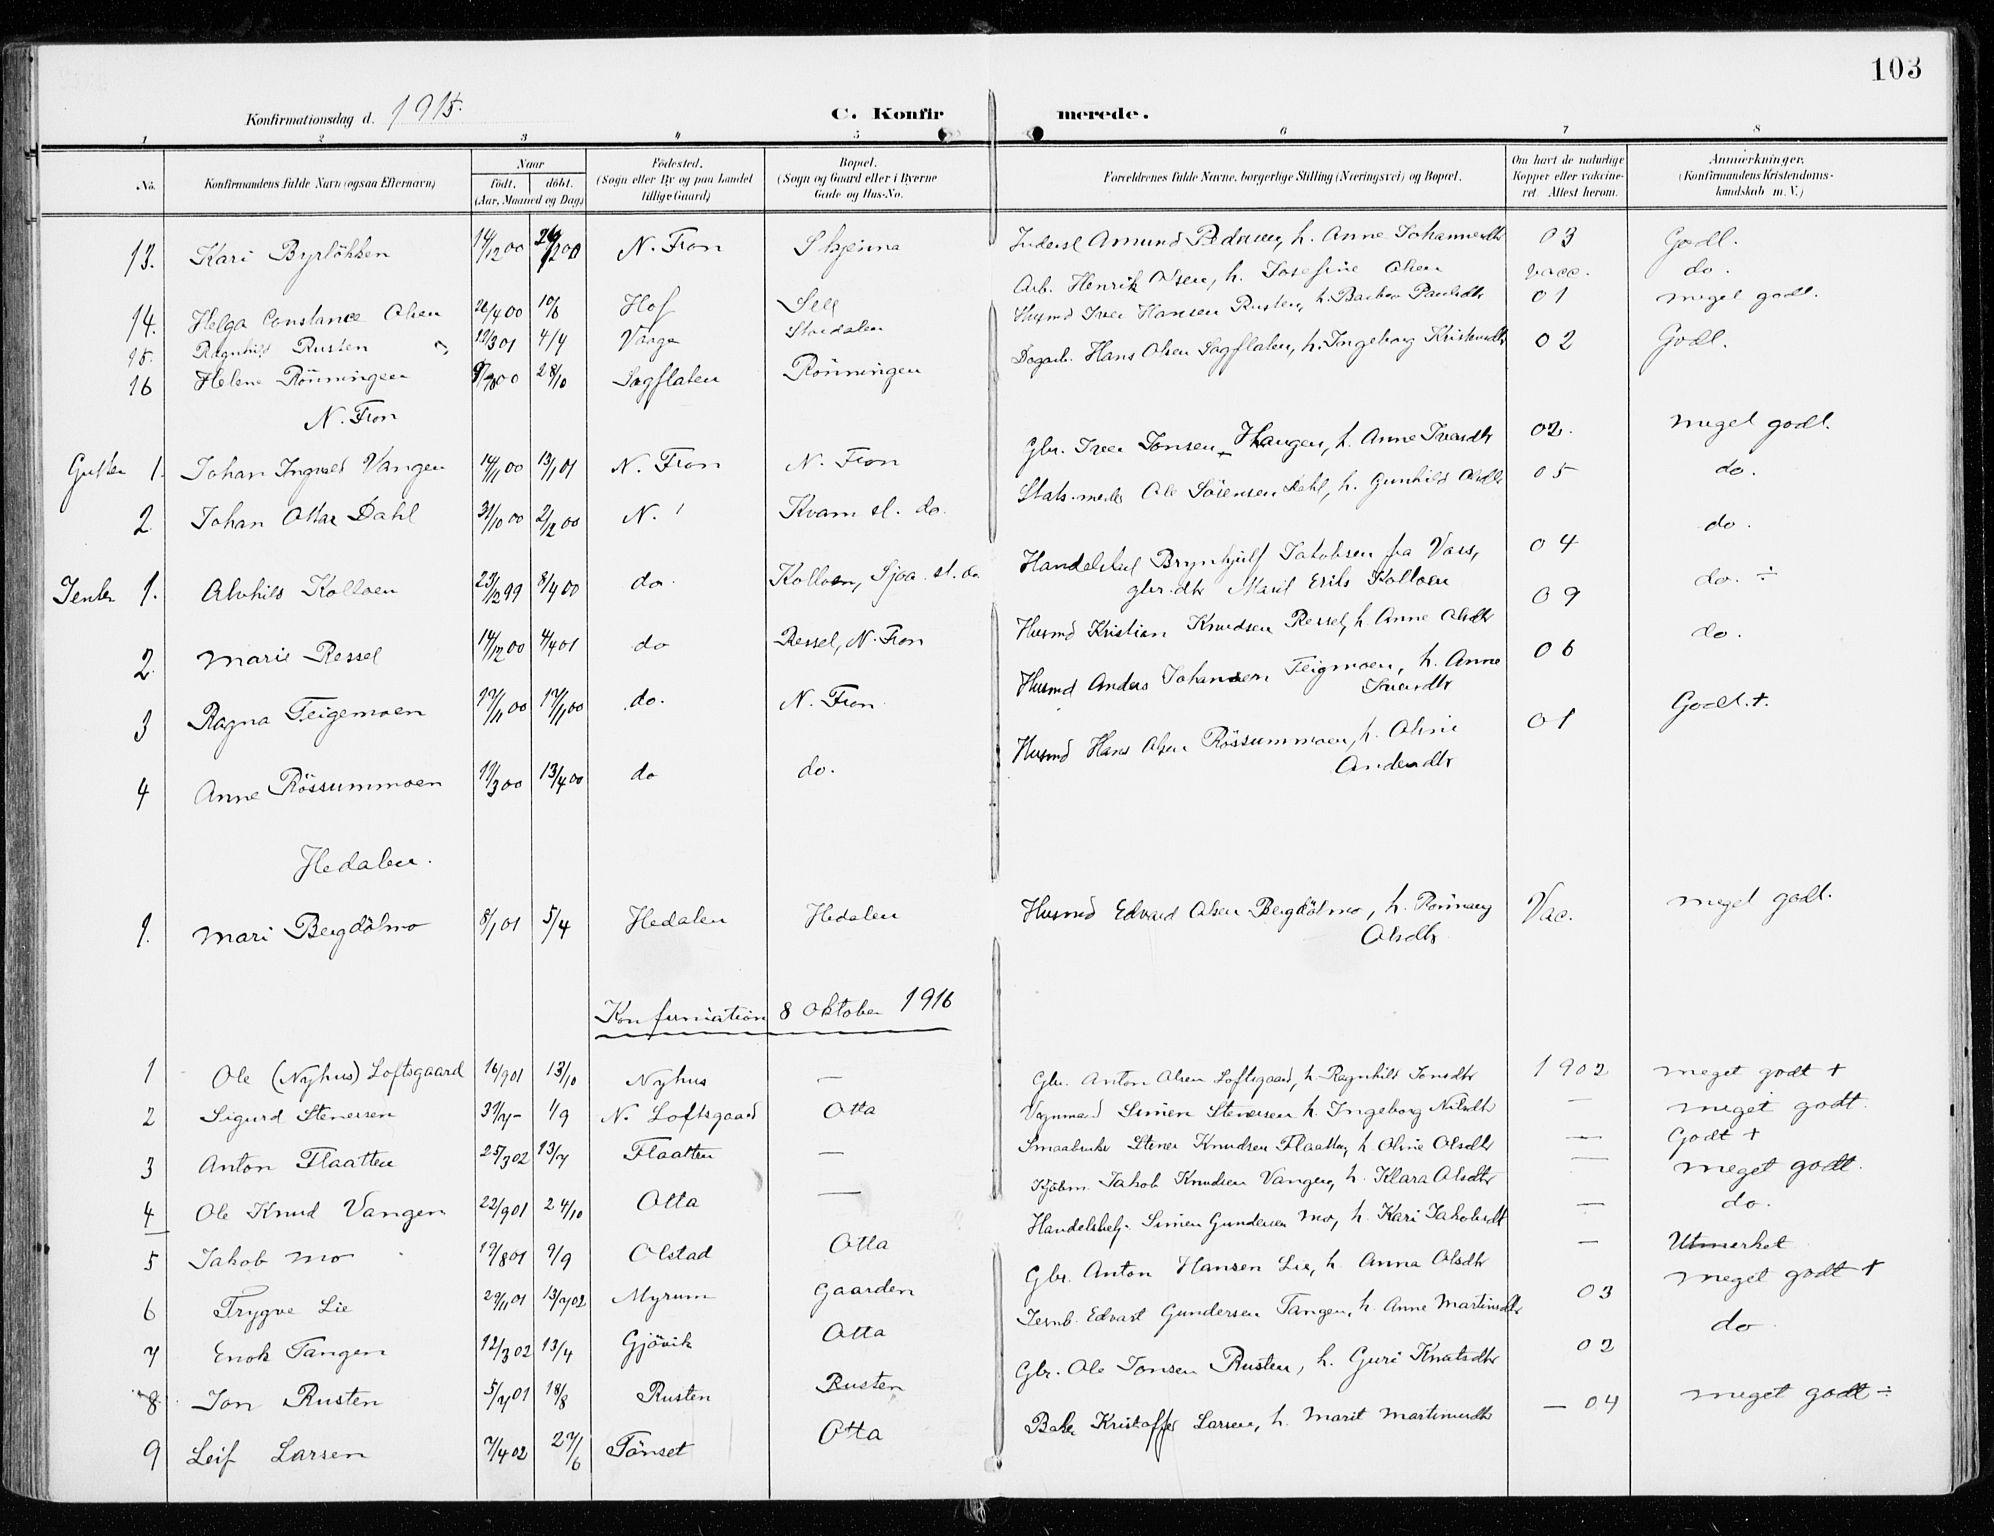 SAH, Sel prestekontor, Ministerialbok nr. 2, 1905-1919, s. 103